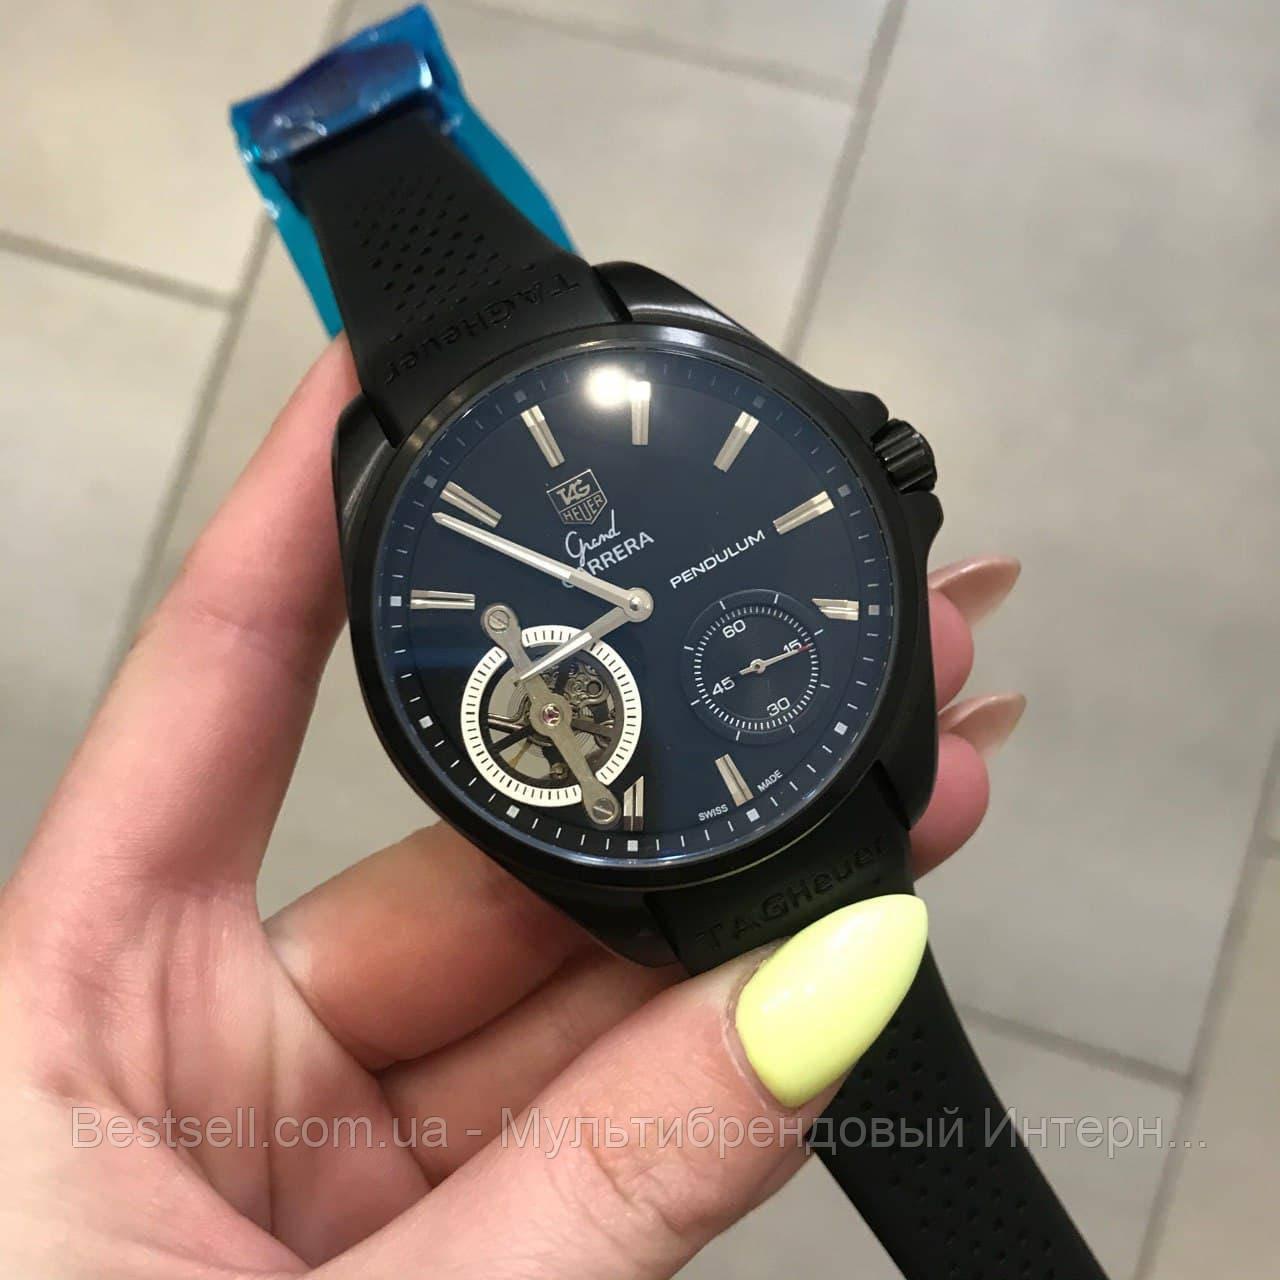 Часы мужские наручные Tag Heuer Grand Carrera Pendulum All Black / реплика ААА класса / Видеообзор